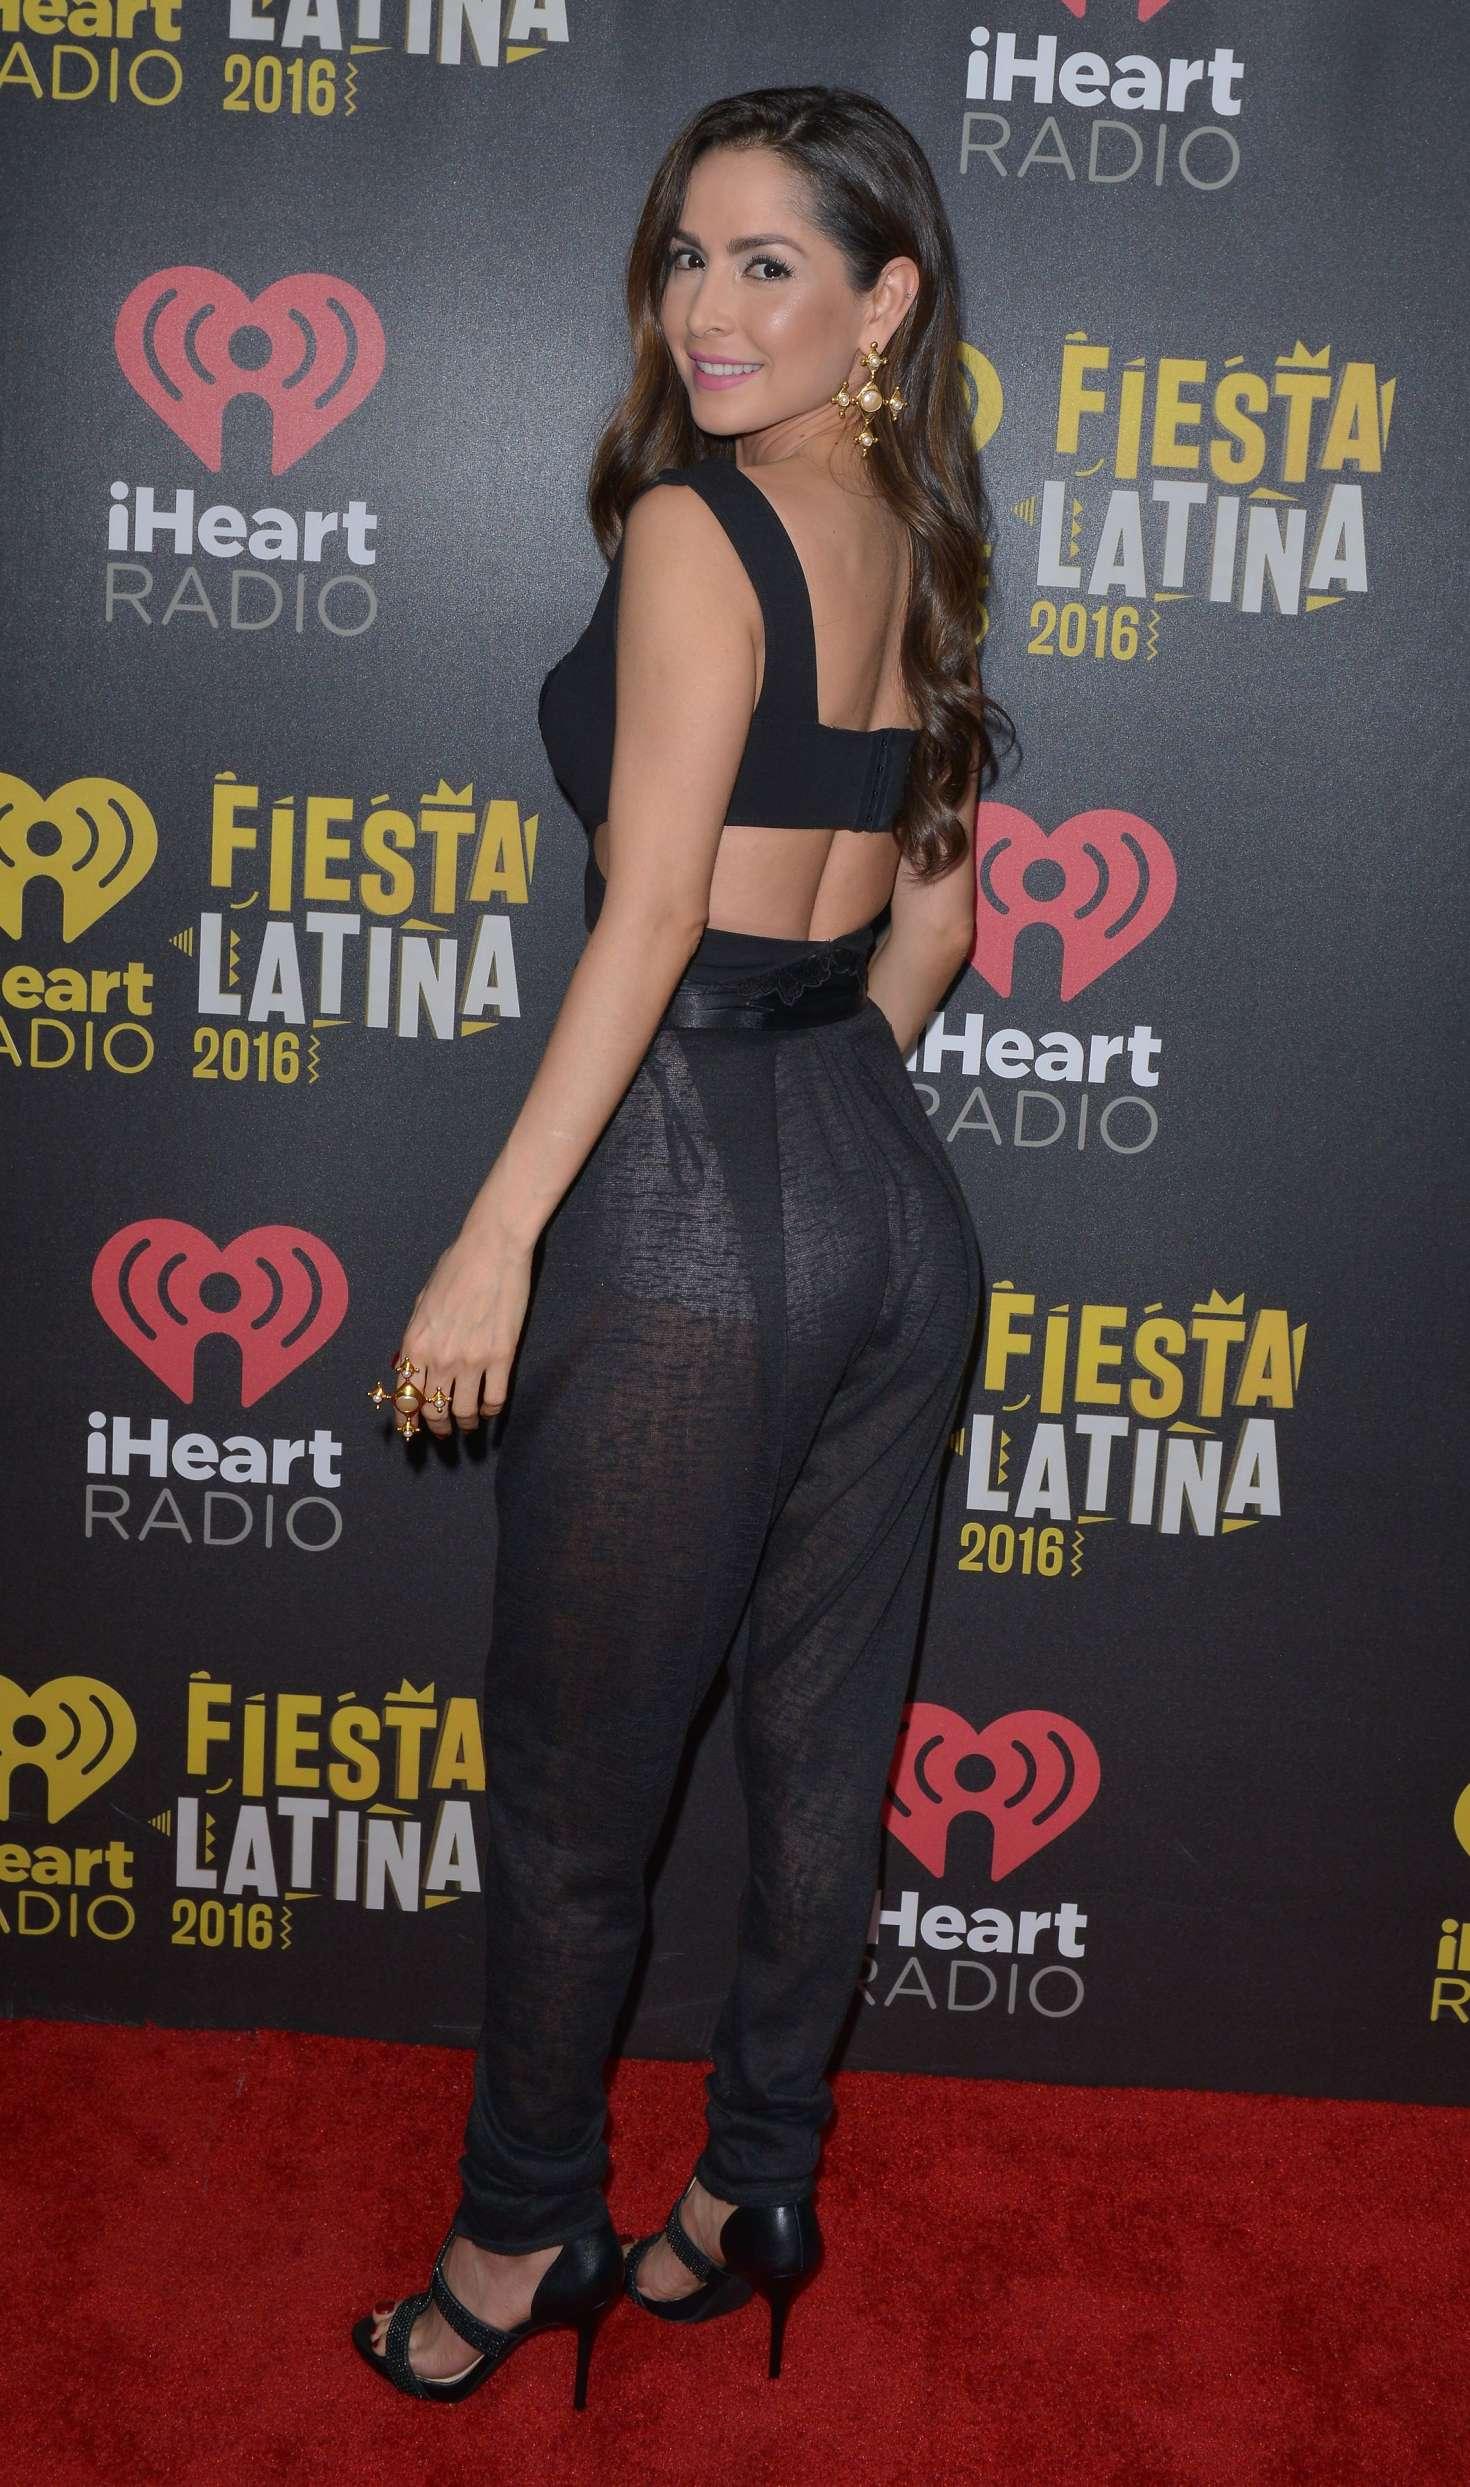 Carmen Villalobos Iheart Radio Fiesta Latina 2016 03